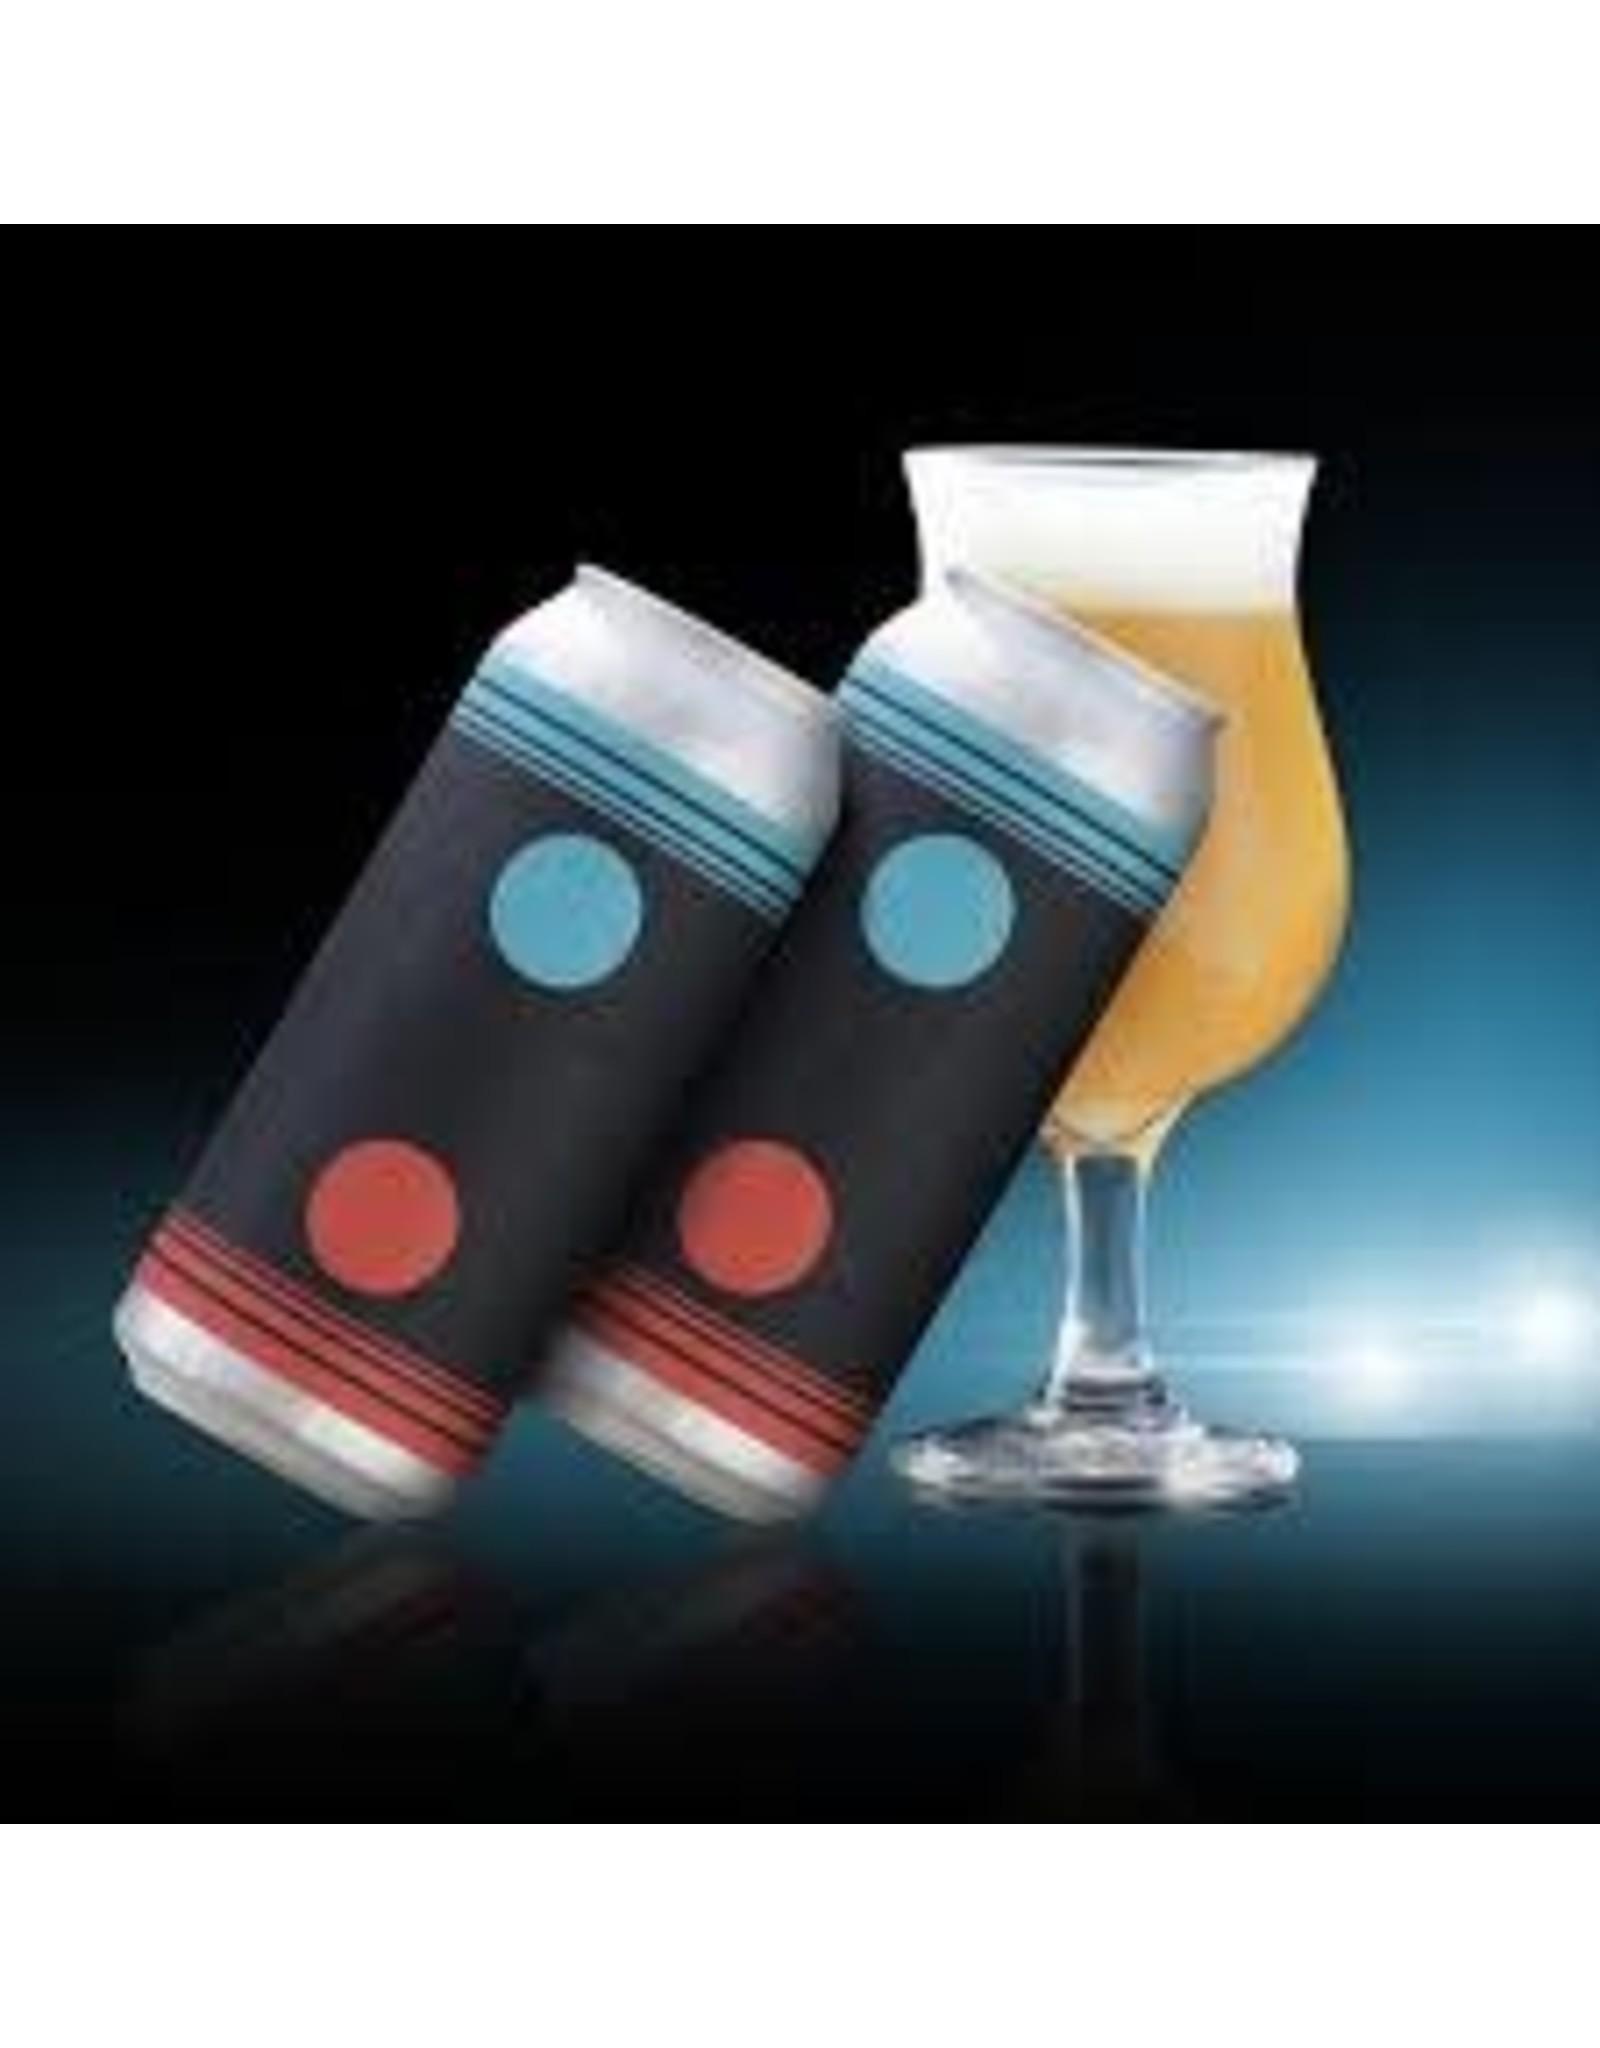 Aslin Brewing Company Aslin Stellar Parallax 4pk can